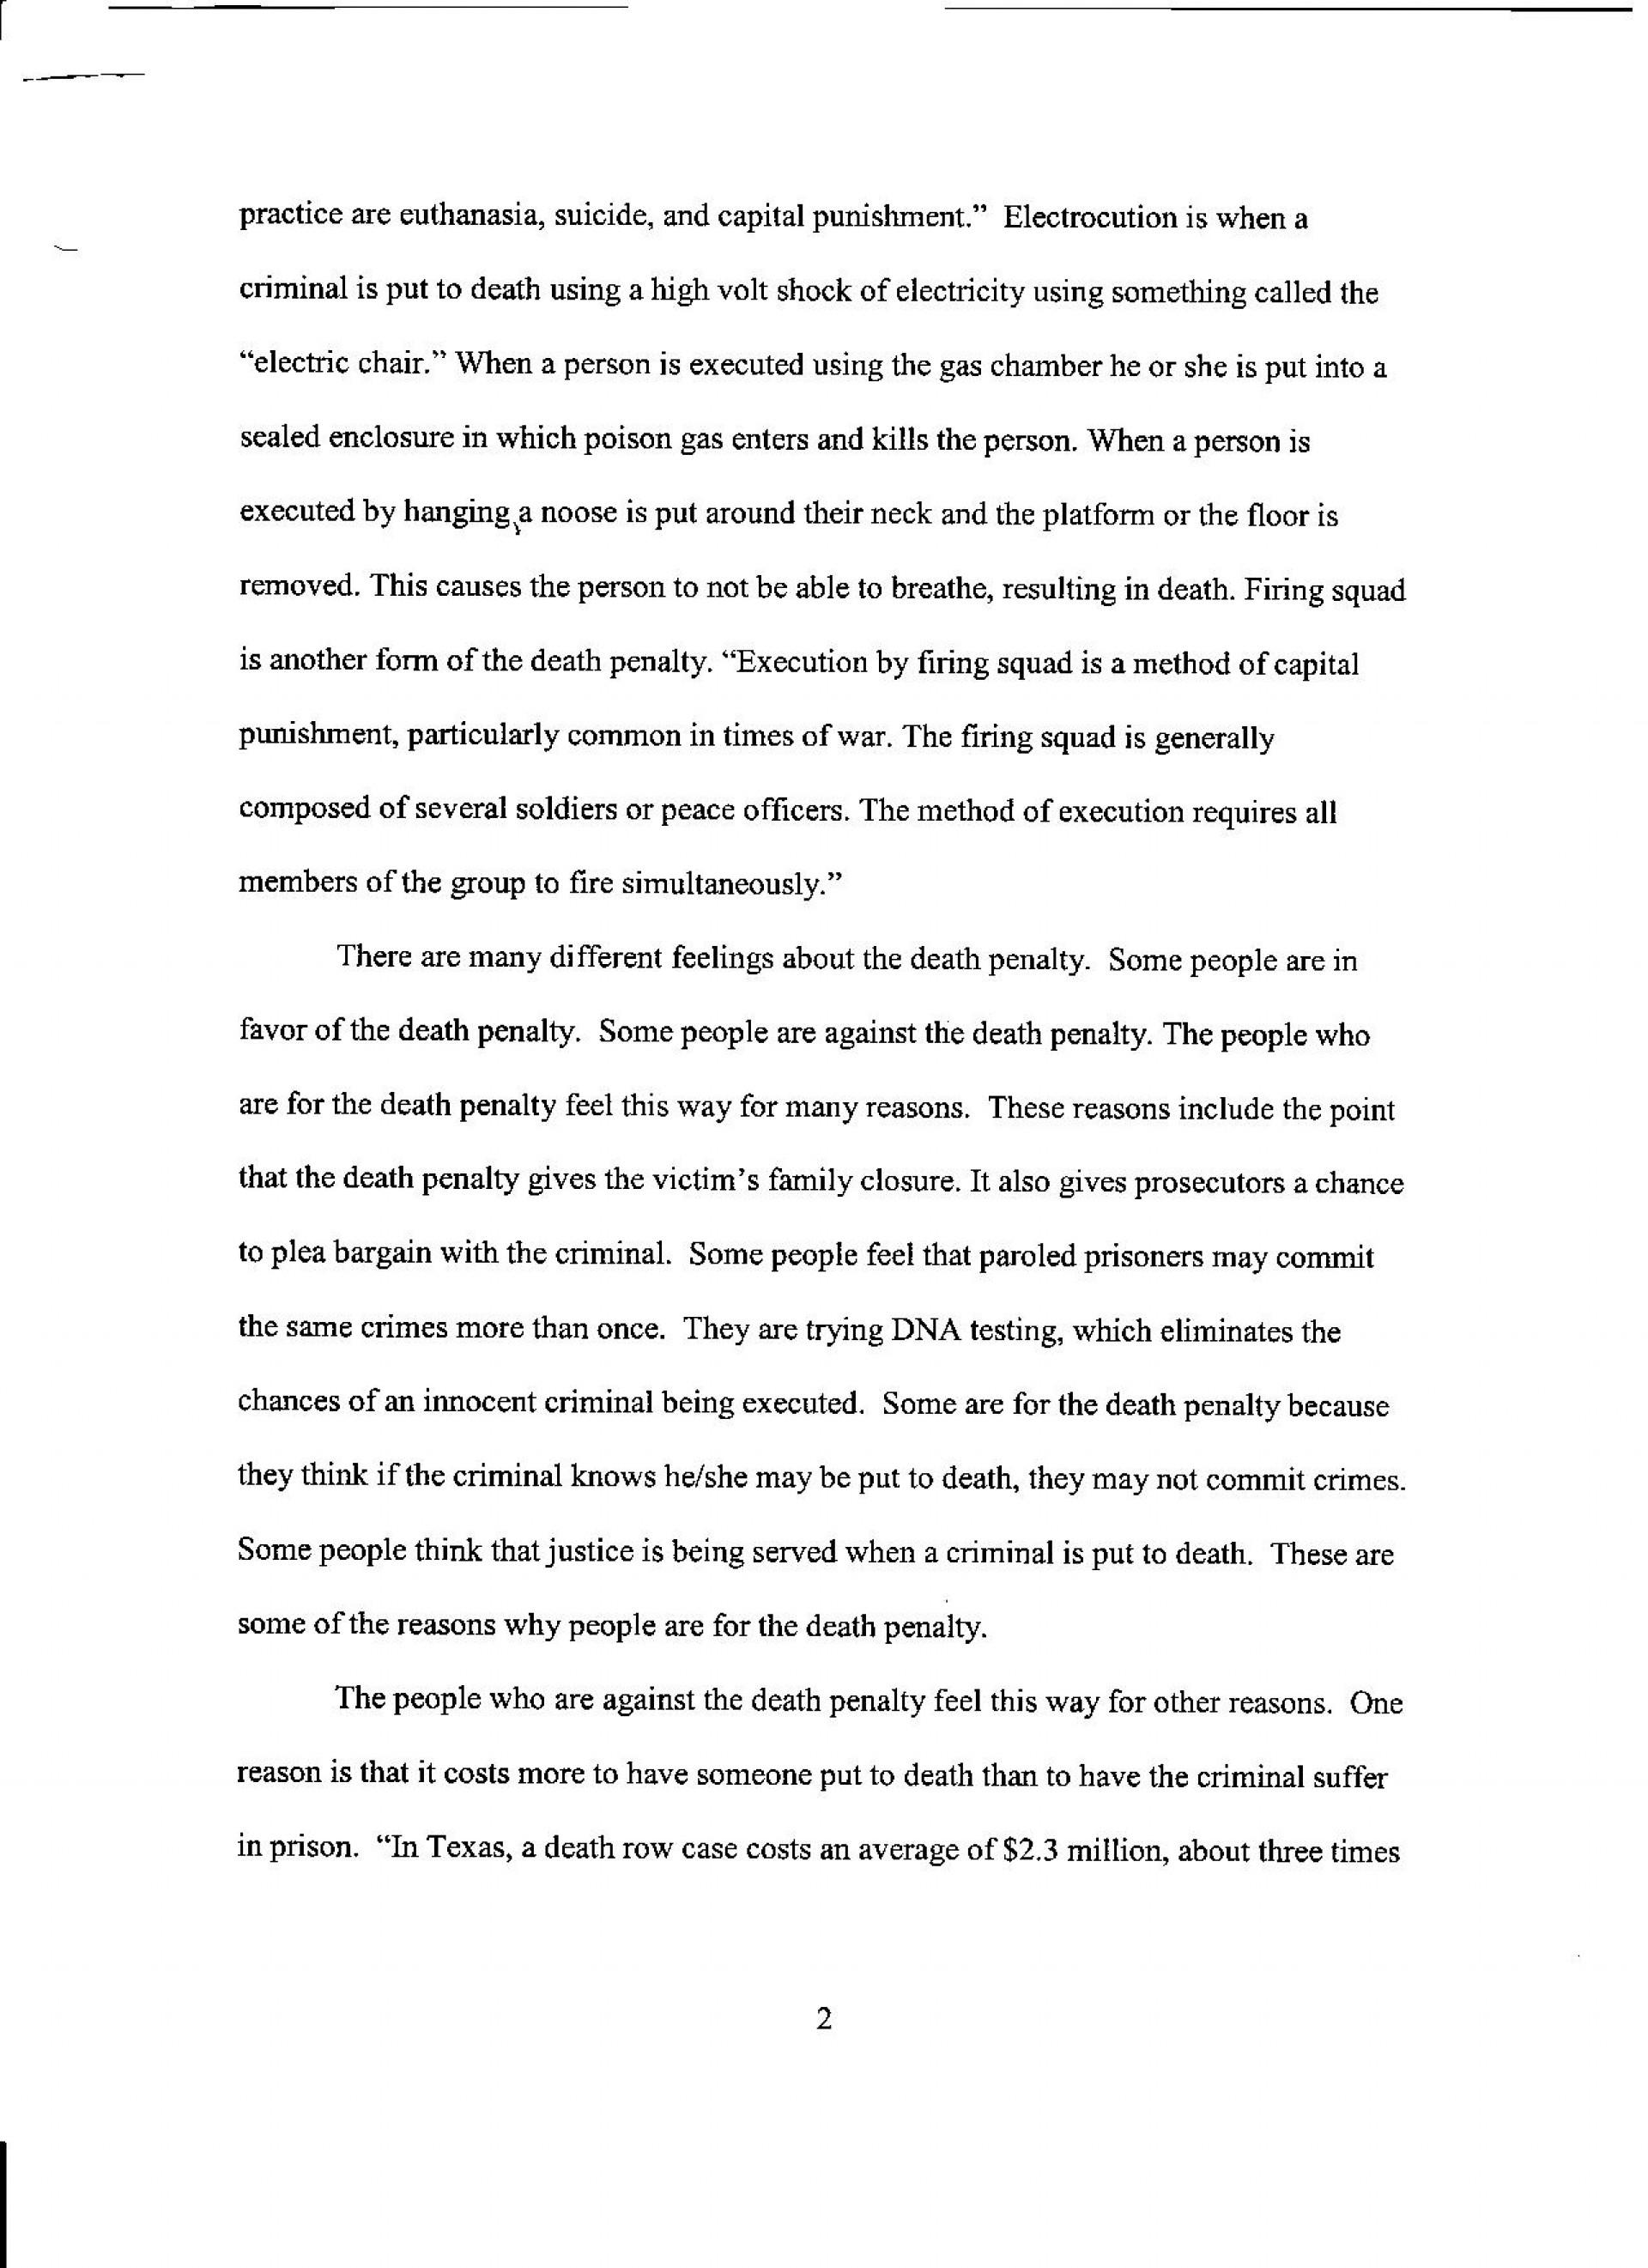 005 Essay Example Pro Death Penalty Essays Persuasive Conclusion Quotes Paragraph Fearsome Con Debate Argumentative Outline 1920